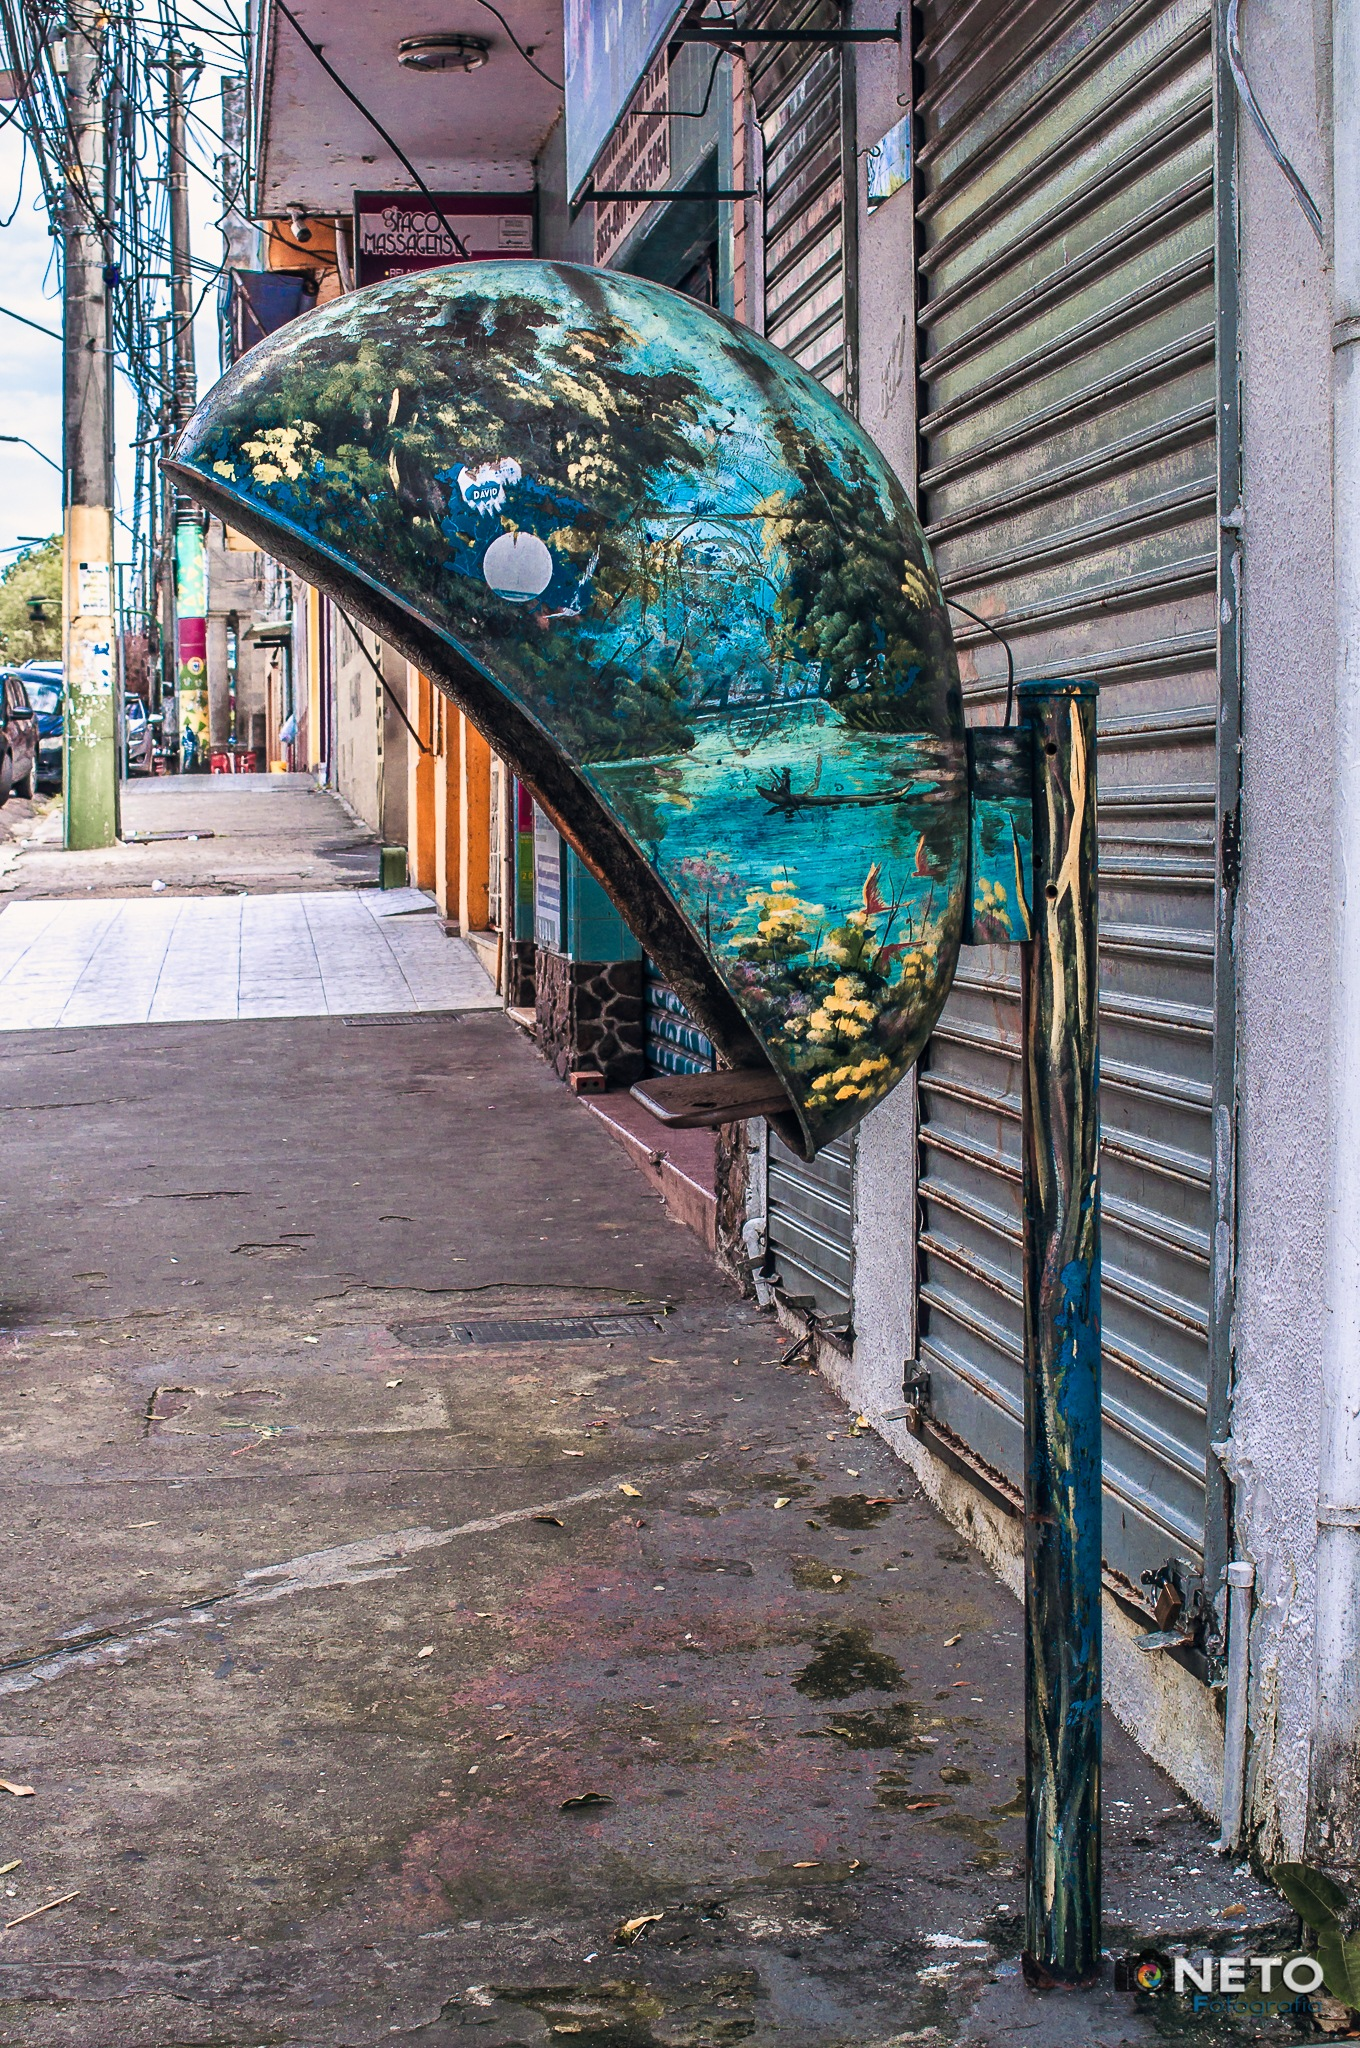 Untitled by Alceu Normando Neto